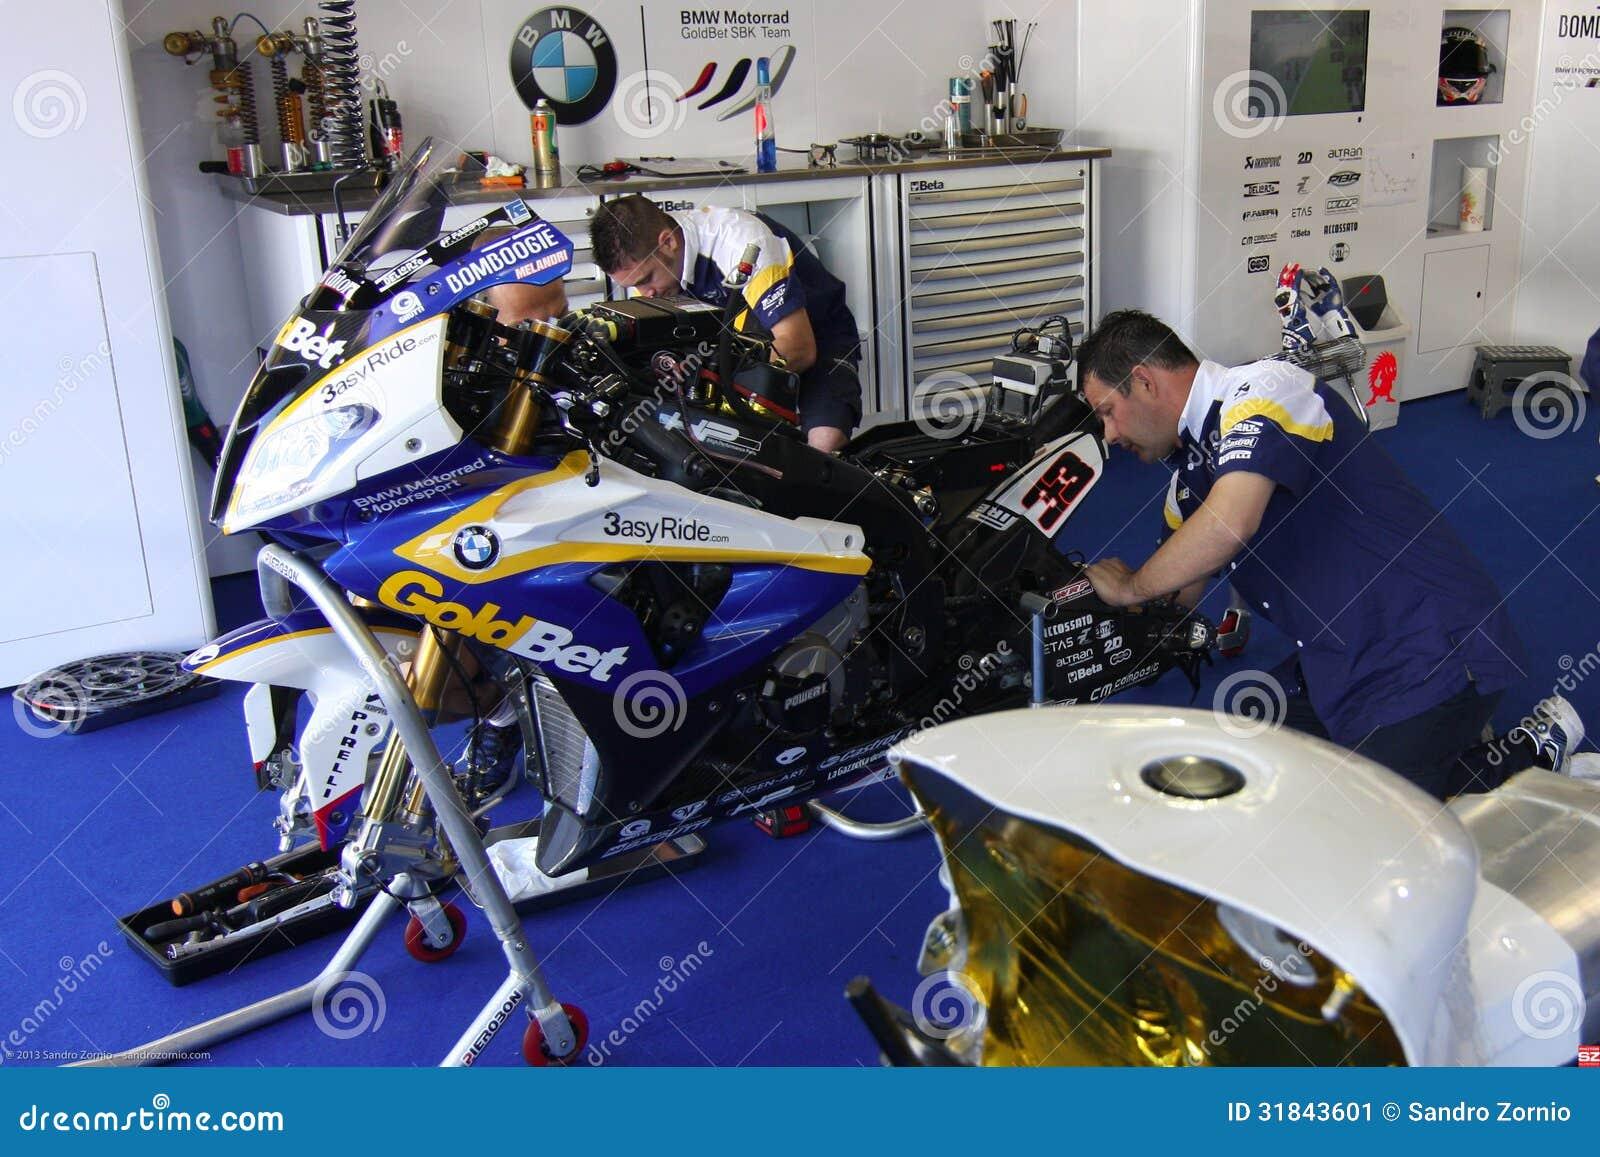 Mechanical working on BMW S1000 RR with BMW Motorrad GoldBet SBK Team Superbike WSBK